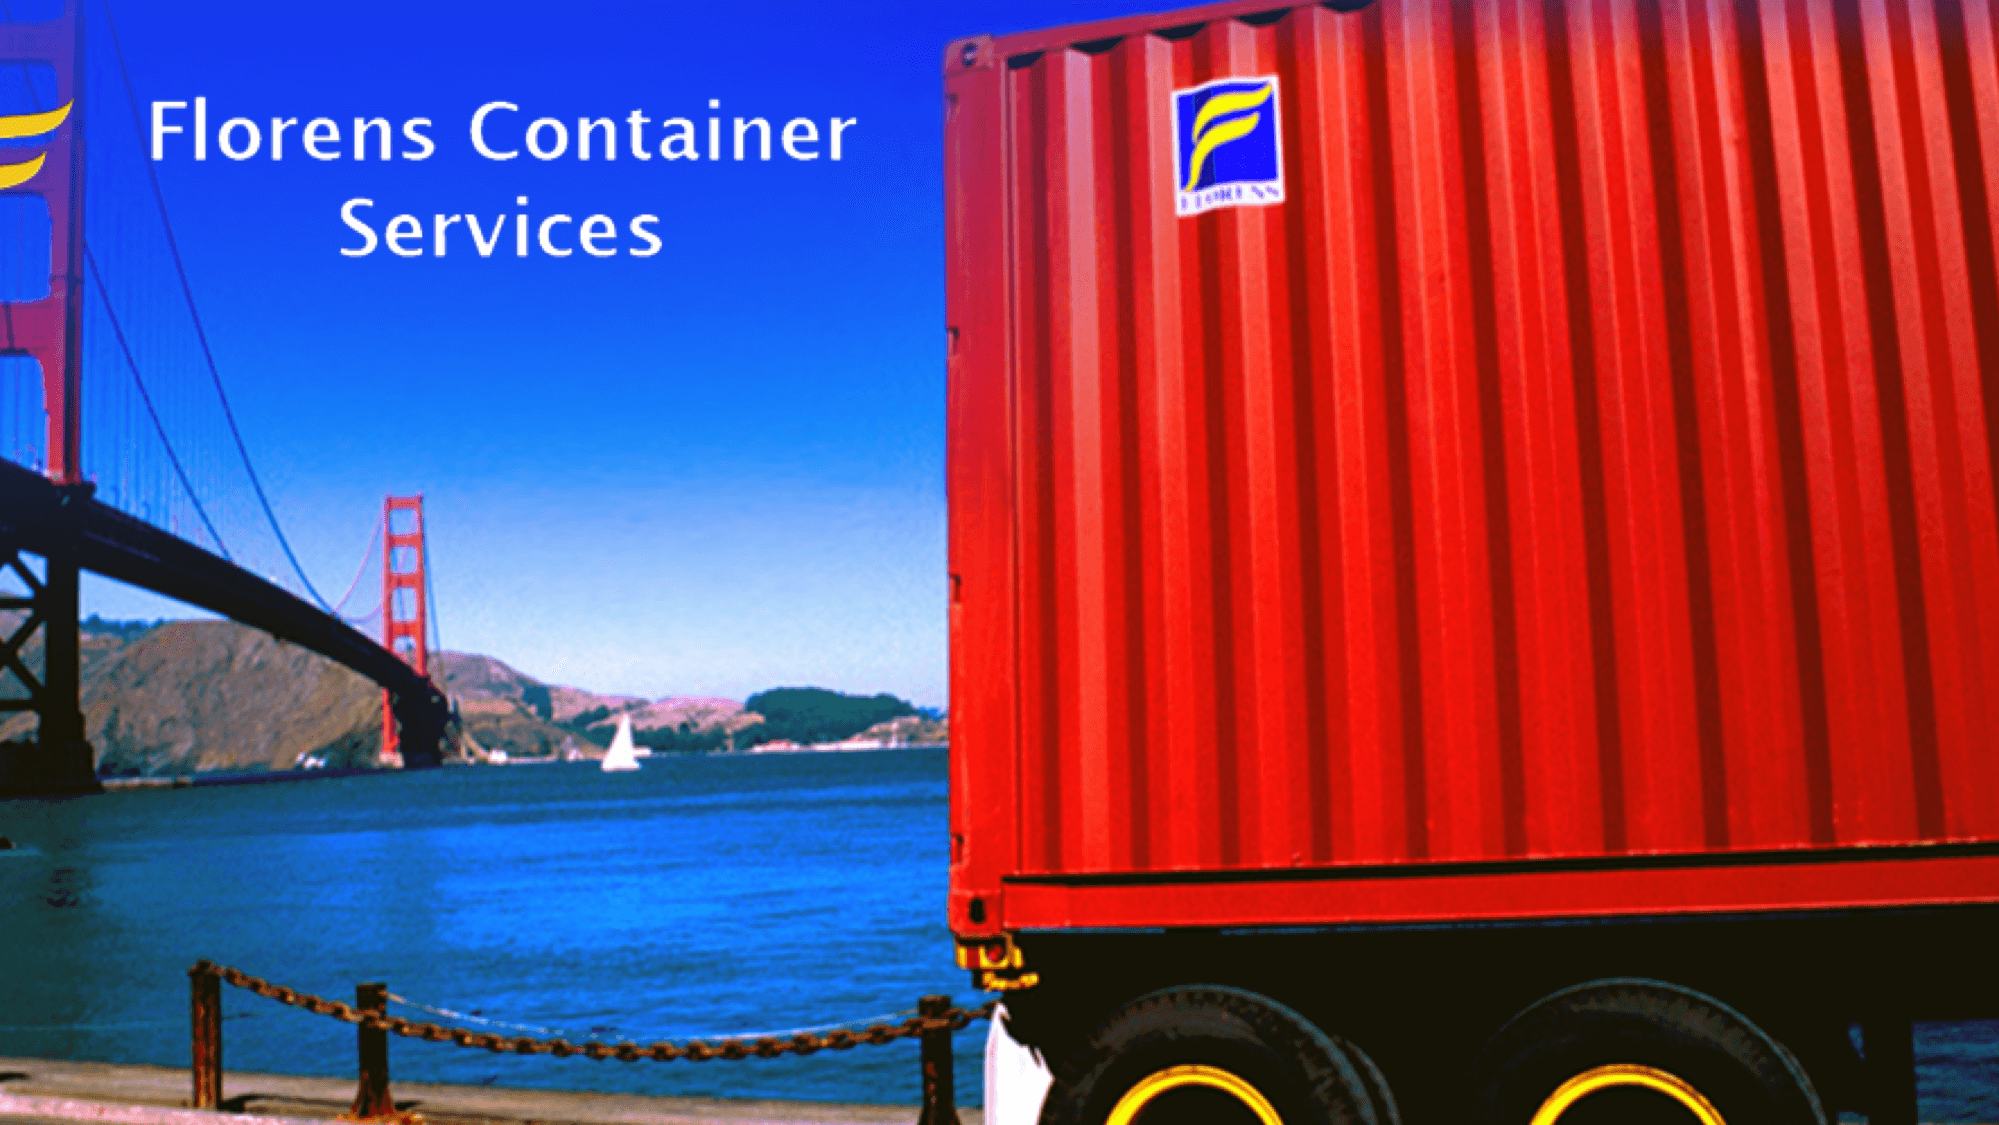 floren container services